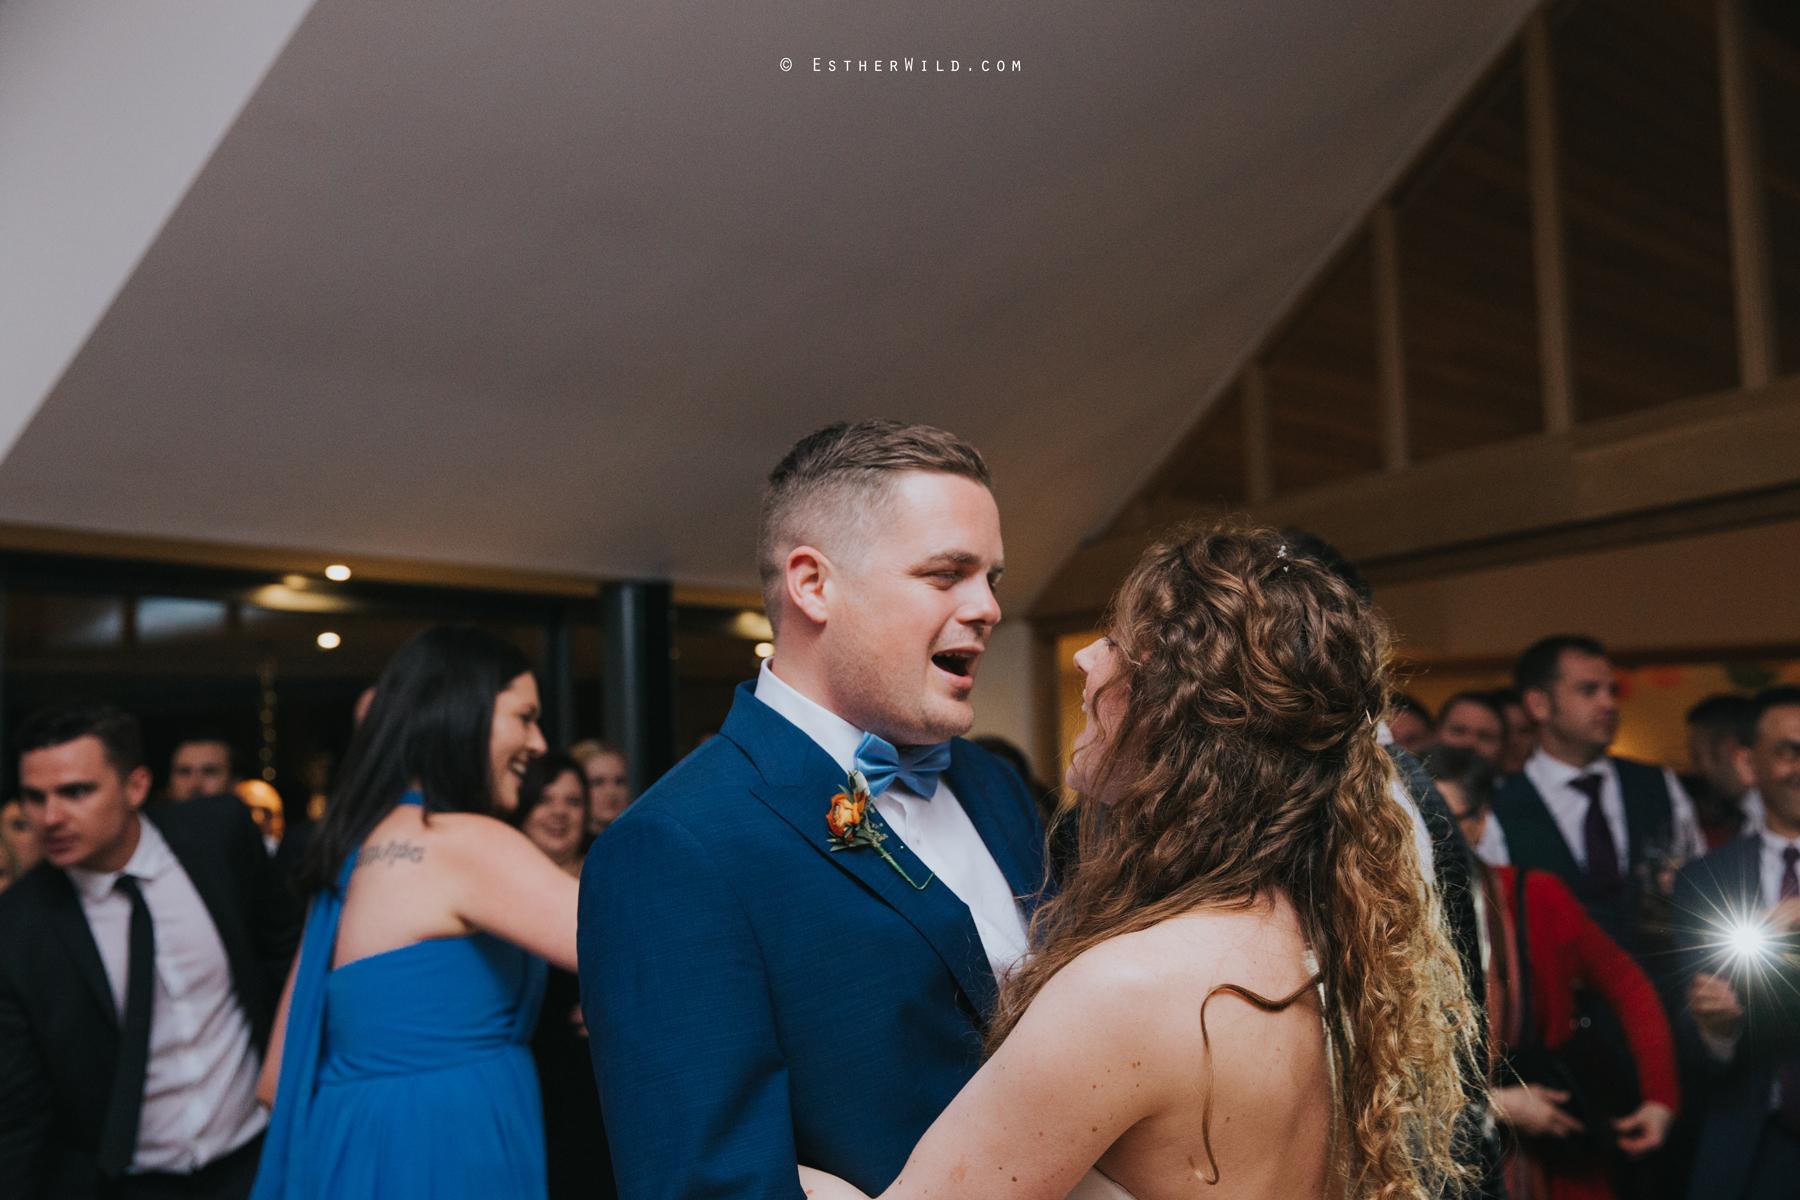 The_BoatHouse_Wedding_Venue_Ormesby_Norfolk_Broads_Boat_Wedding_Photography_Esther_Wild_Photographer_IMG_3575.jpg